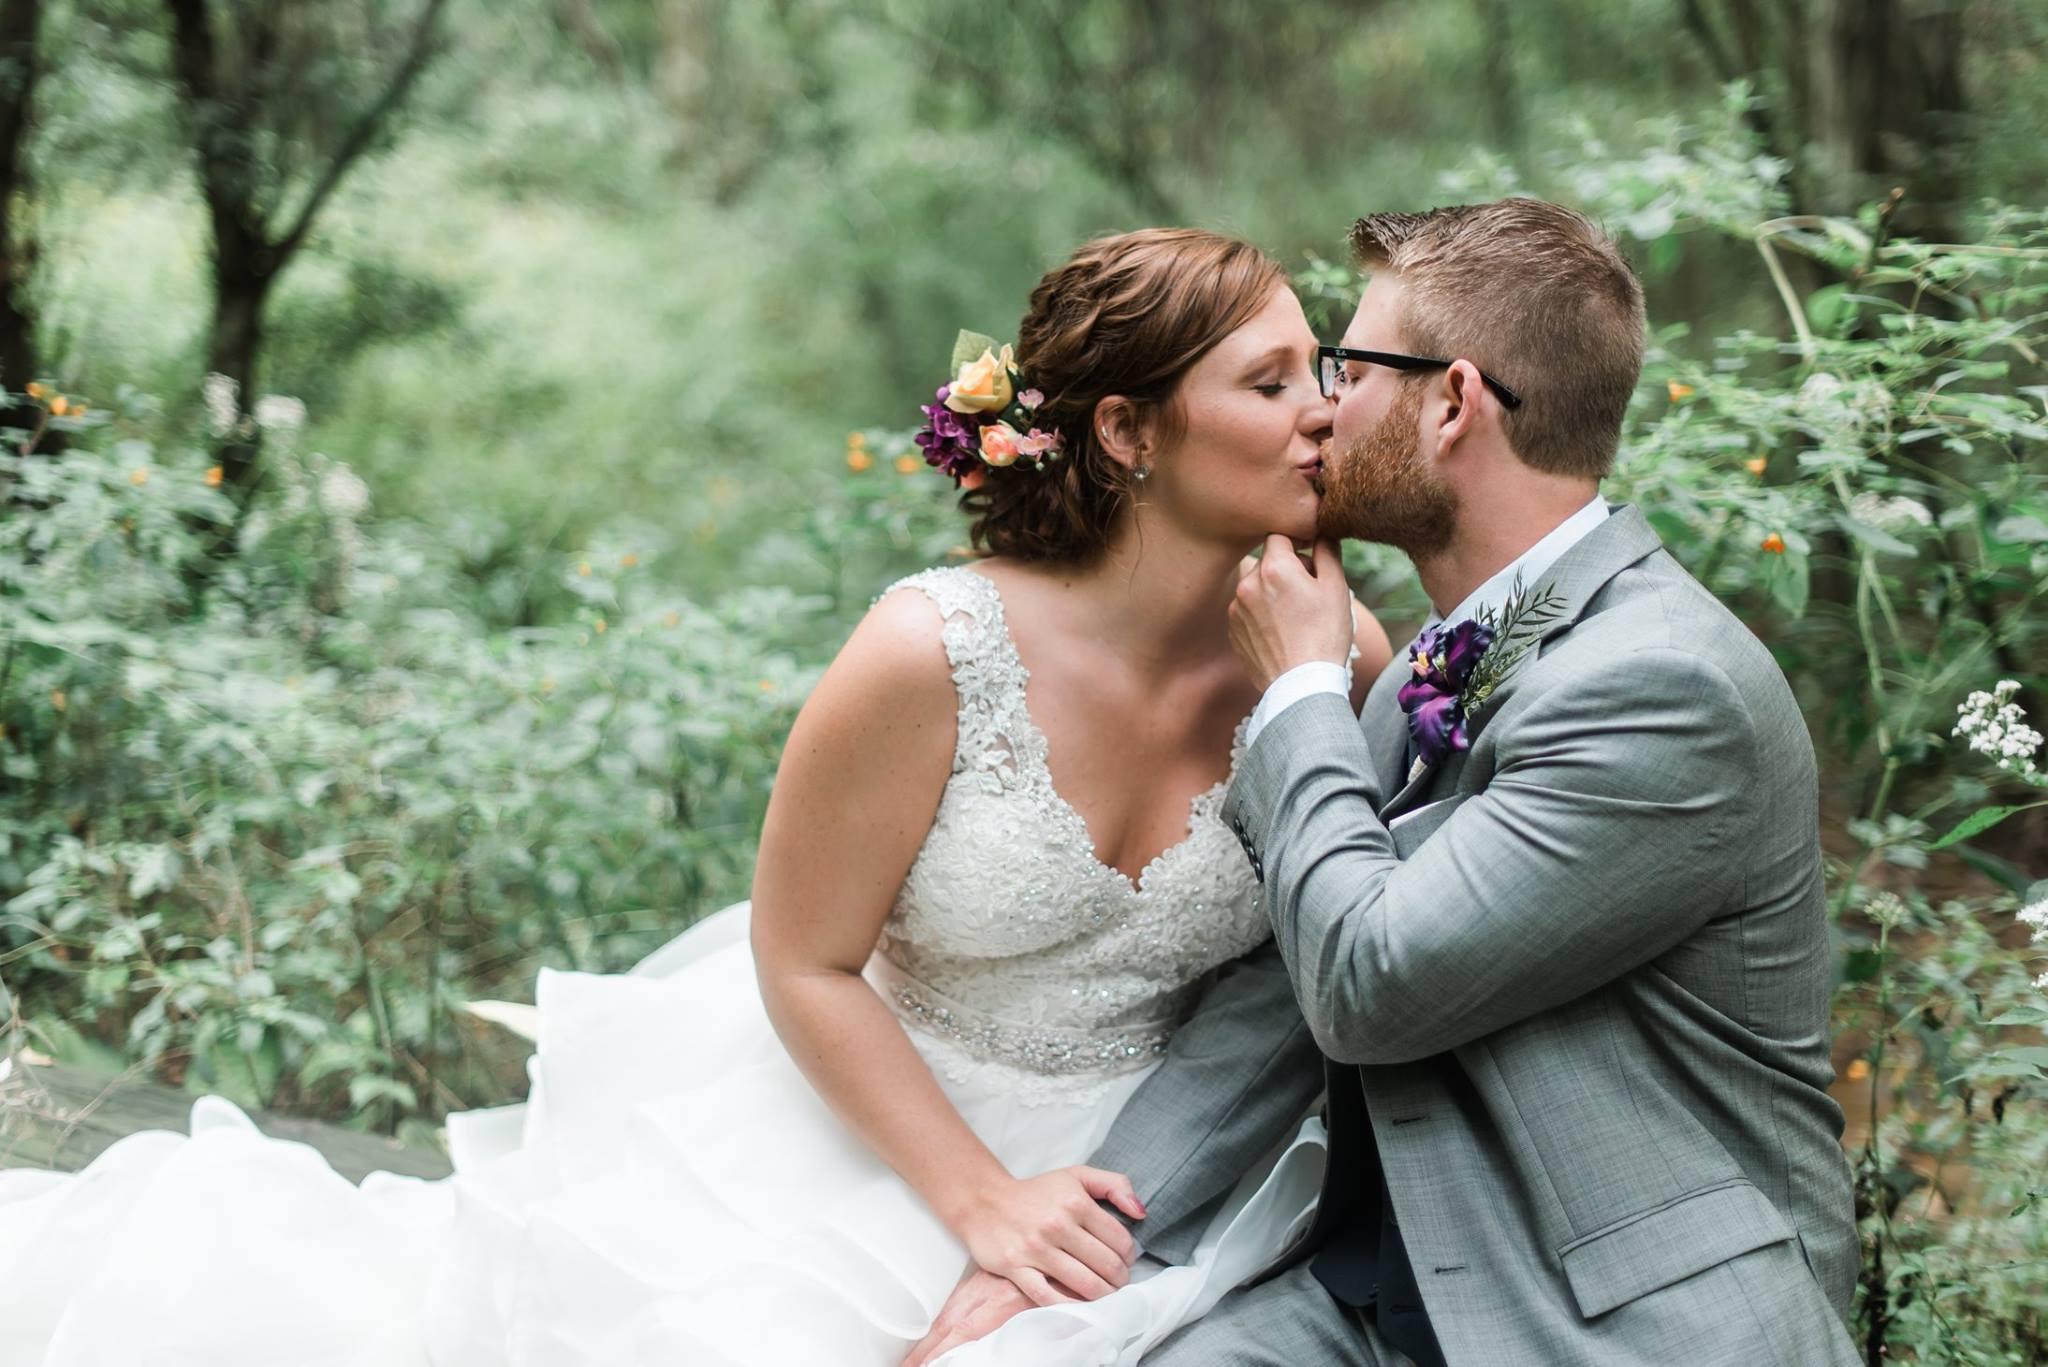 pennsylvania-backyard-wedding-love-diy-bohemian-romantic-colorful-0019.jpg